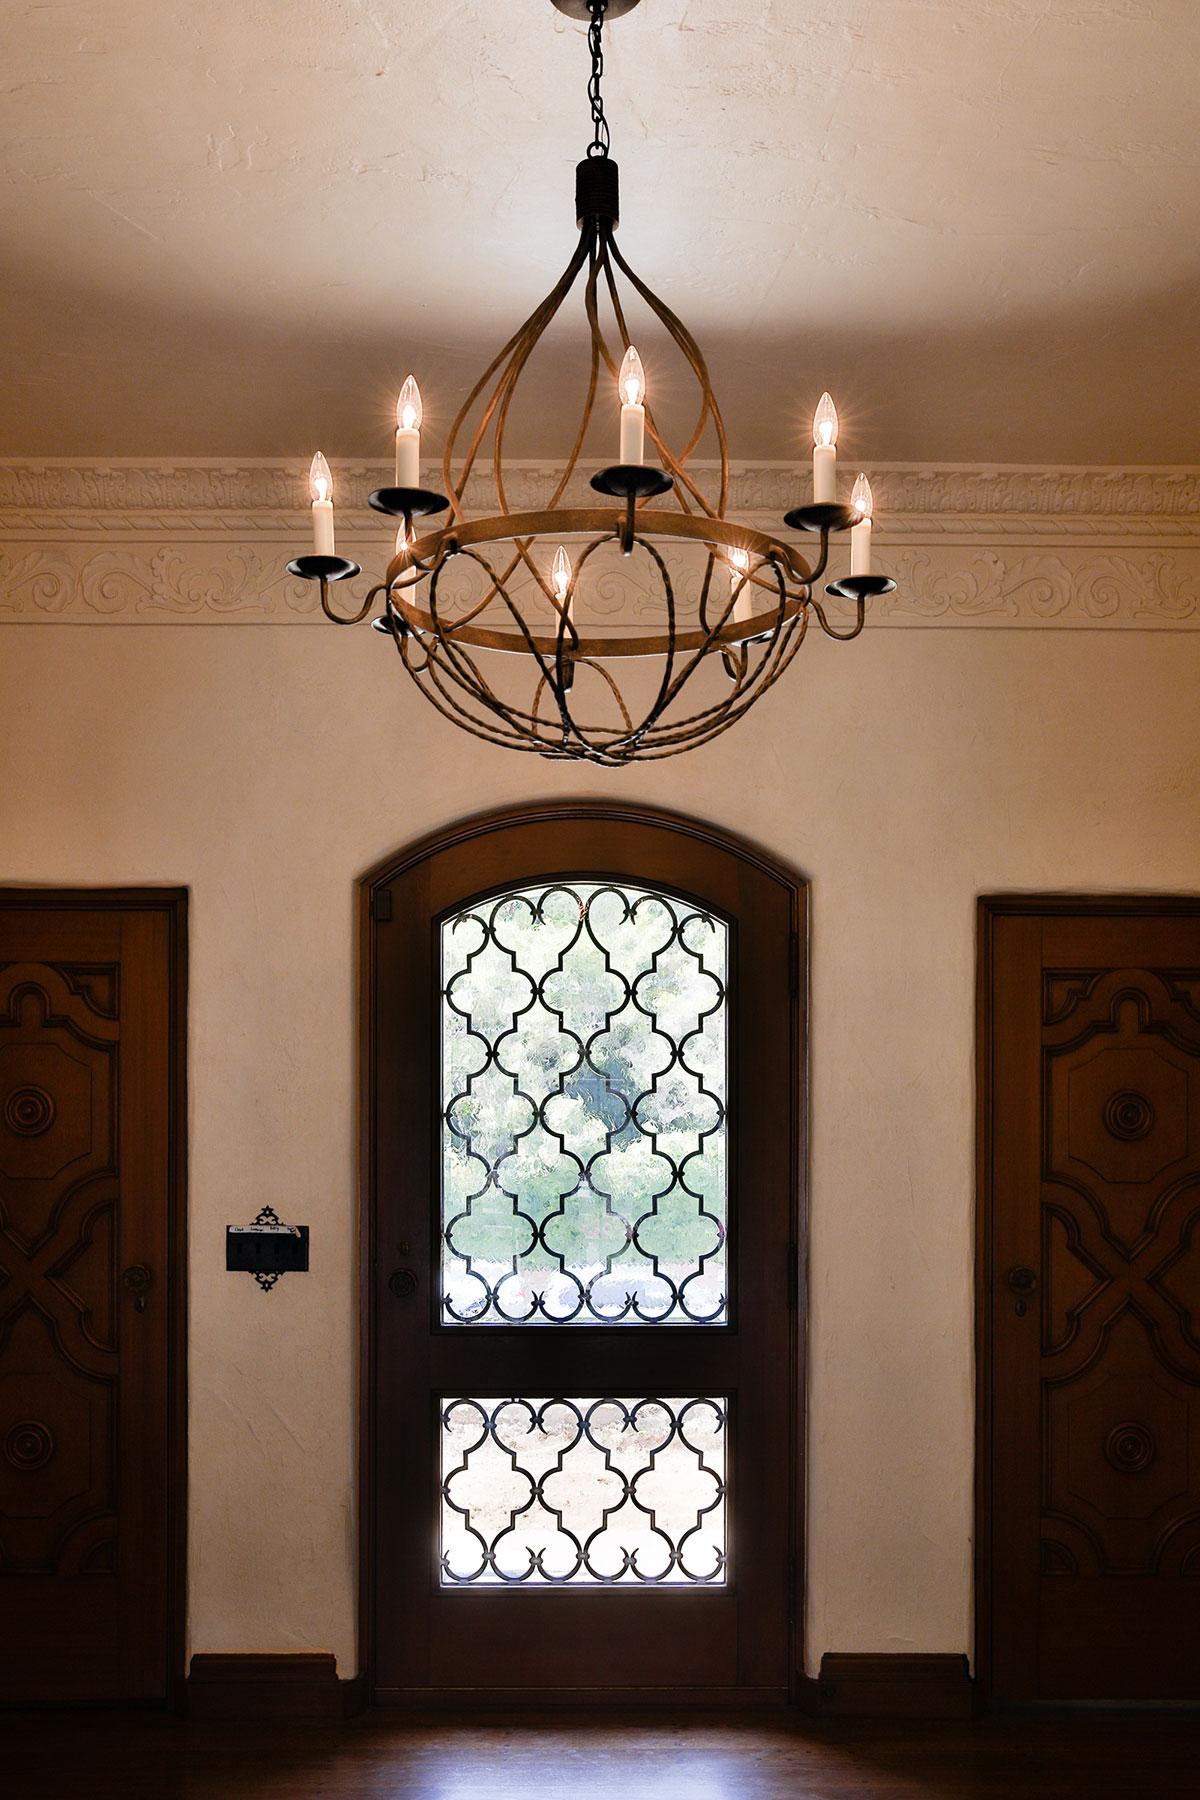 Piedmont Mediterranean Revival Door Looking Out Buestad Construction v2